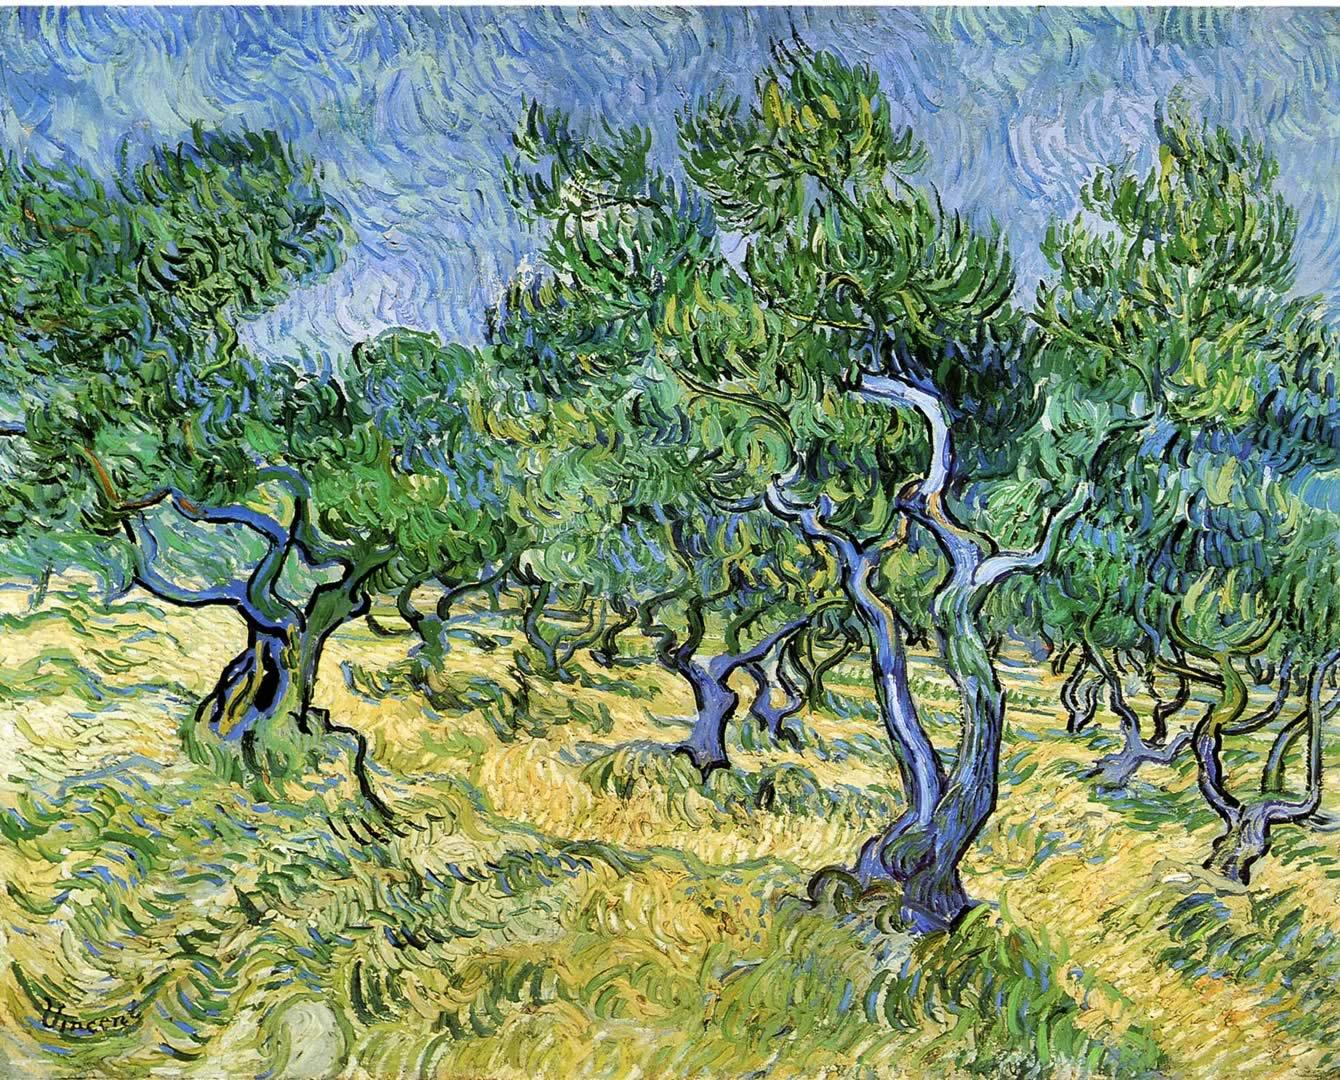 Olive Grove 2 - Vincent Van Gogh Paintings Wallpaper Image